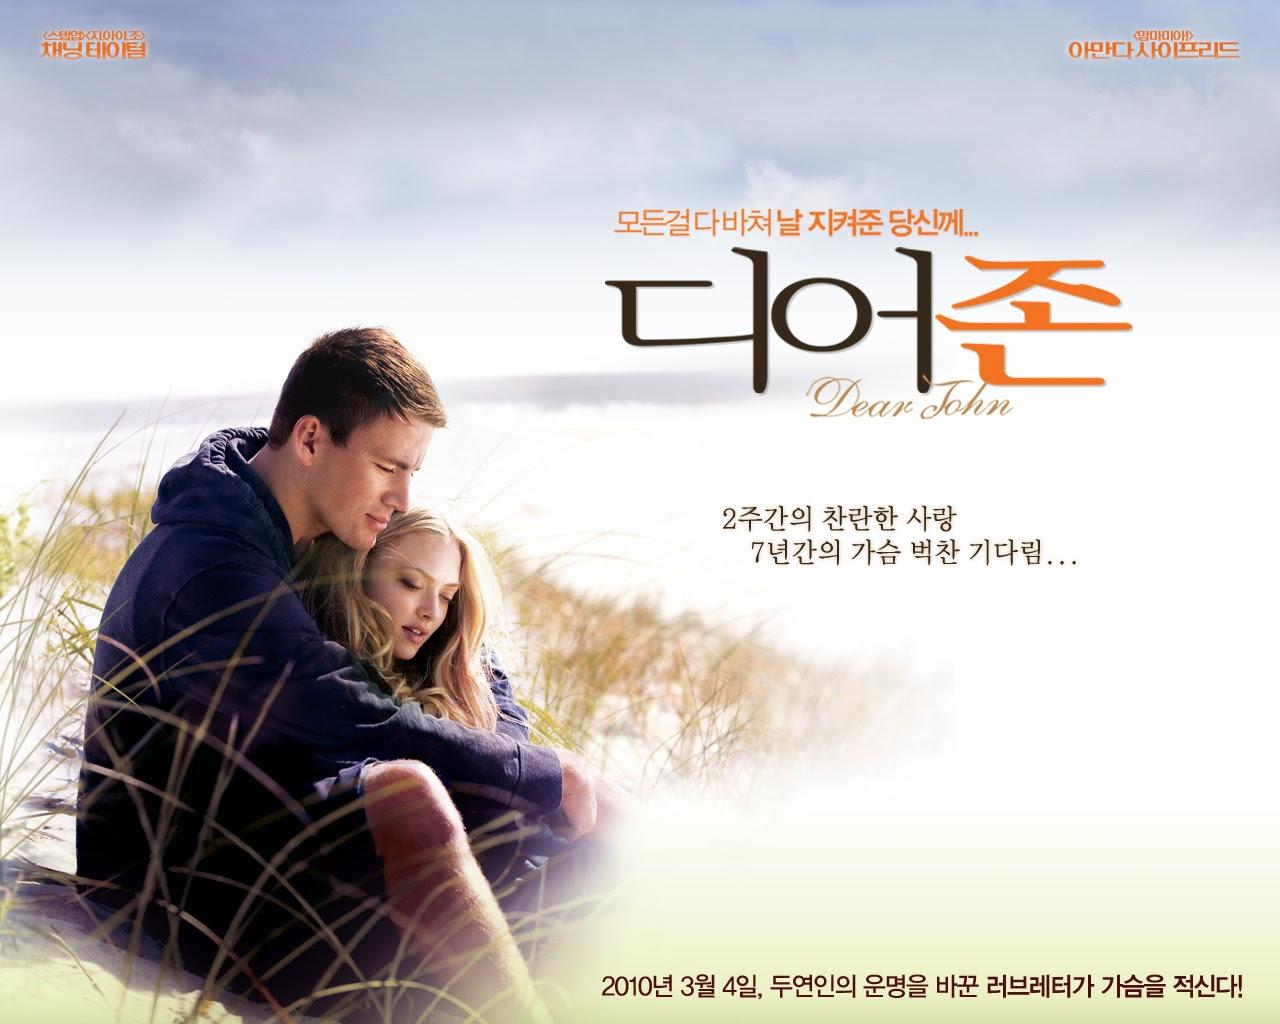 Channing Tatum and Amanda Seyfried in 'Dear John' Posters Korea